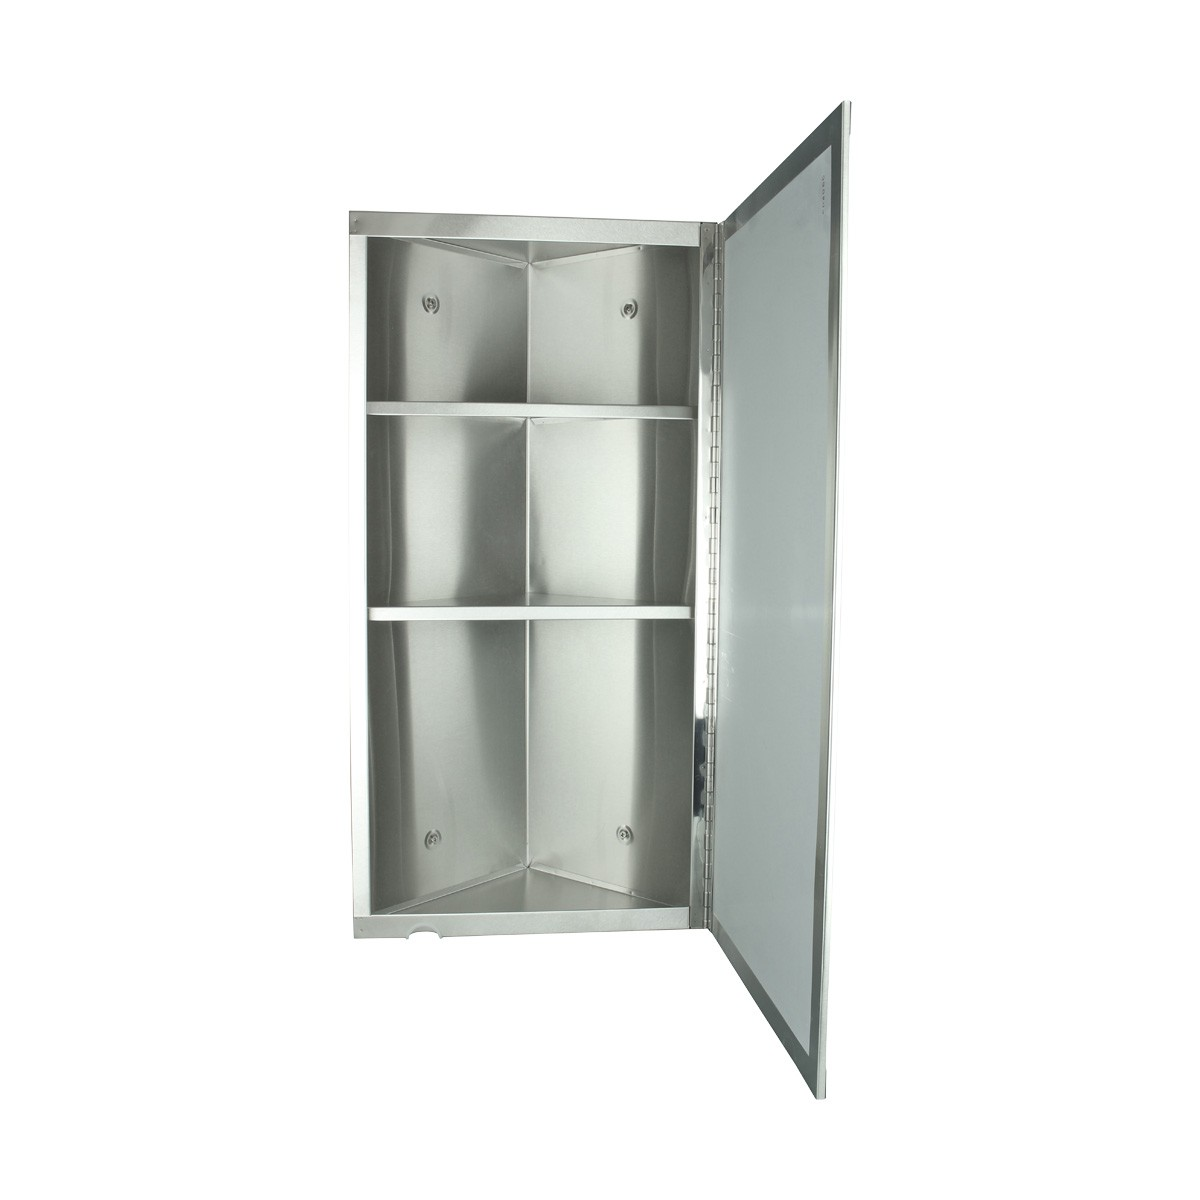 Brushed Stainless Steel Medicine Cabinet Corner Wall Mount Set of 2 Medicine Chest storage medication Medicine Cabinet mirror Bathroom Cabinet